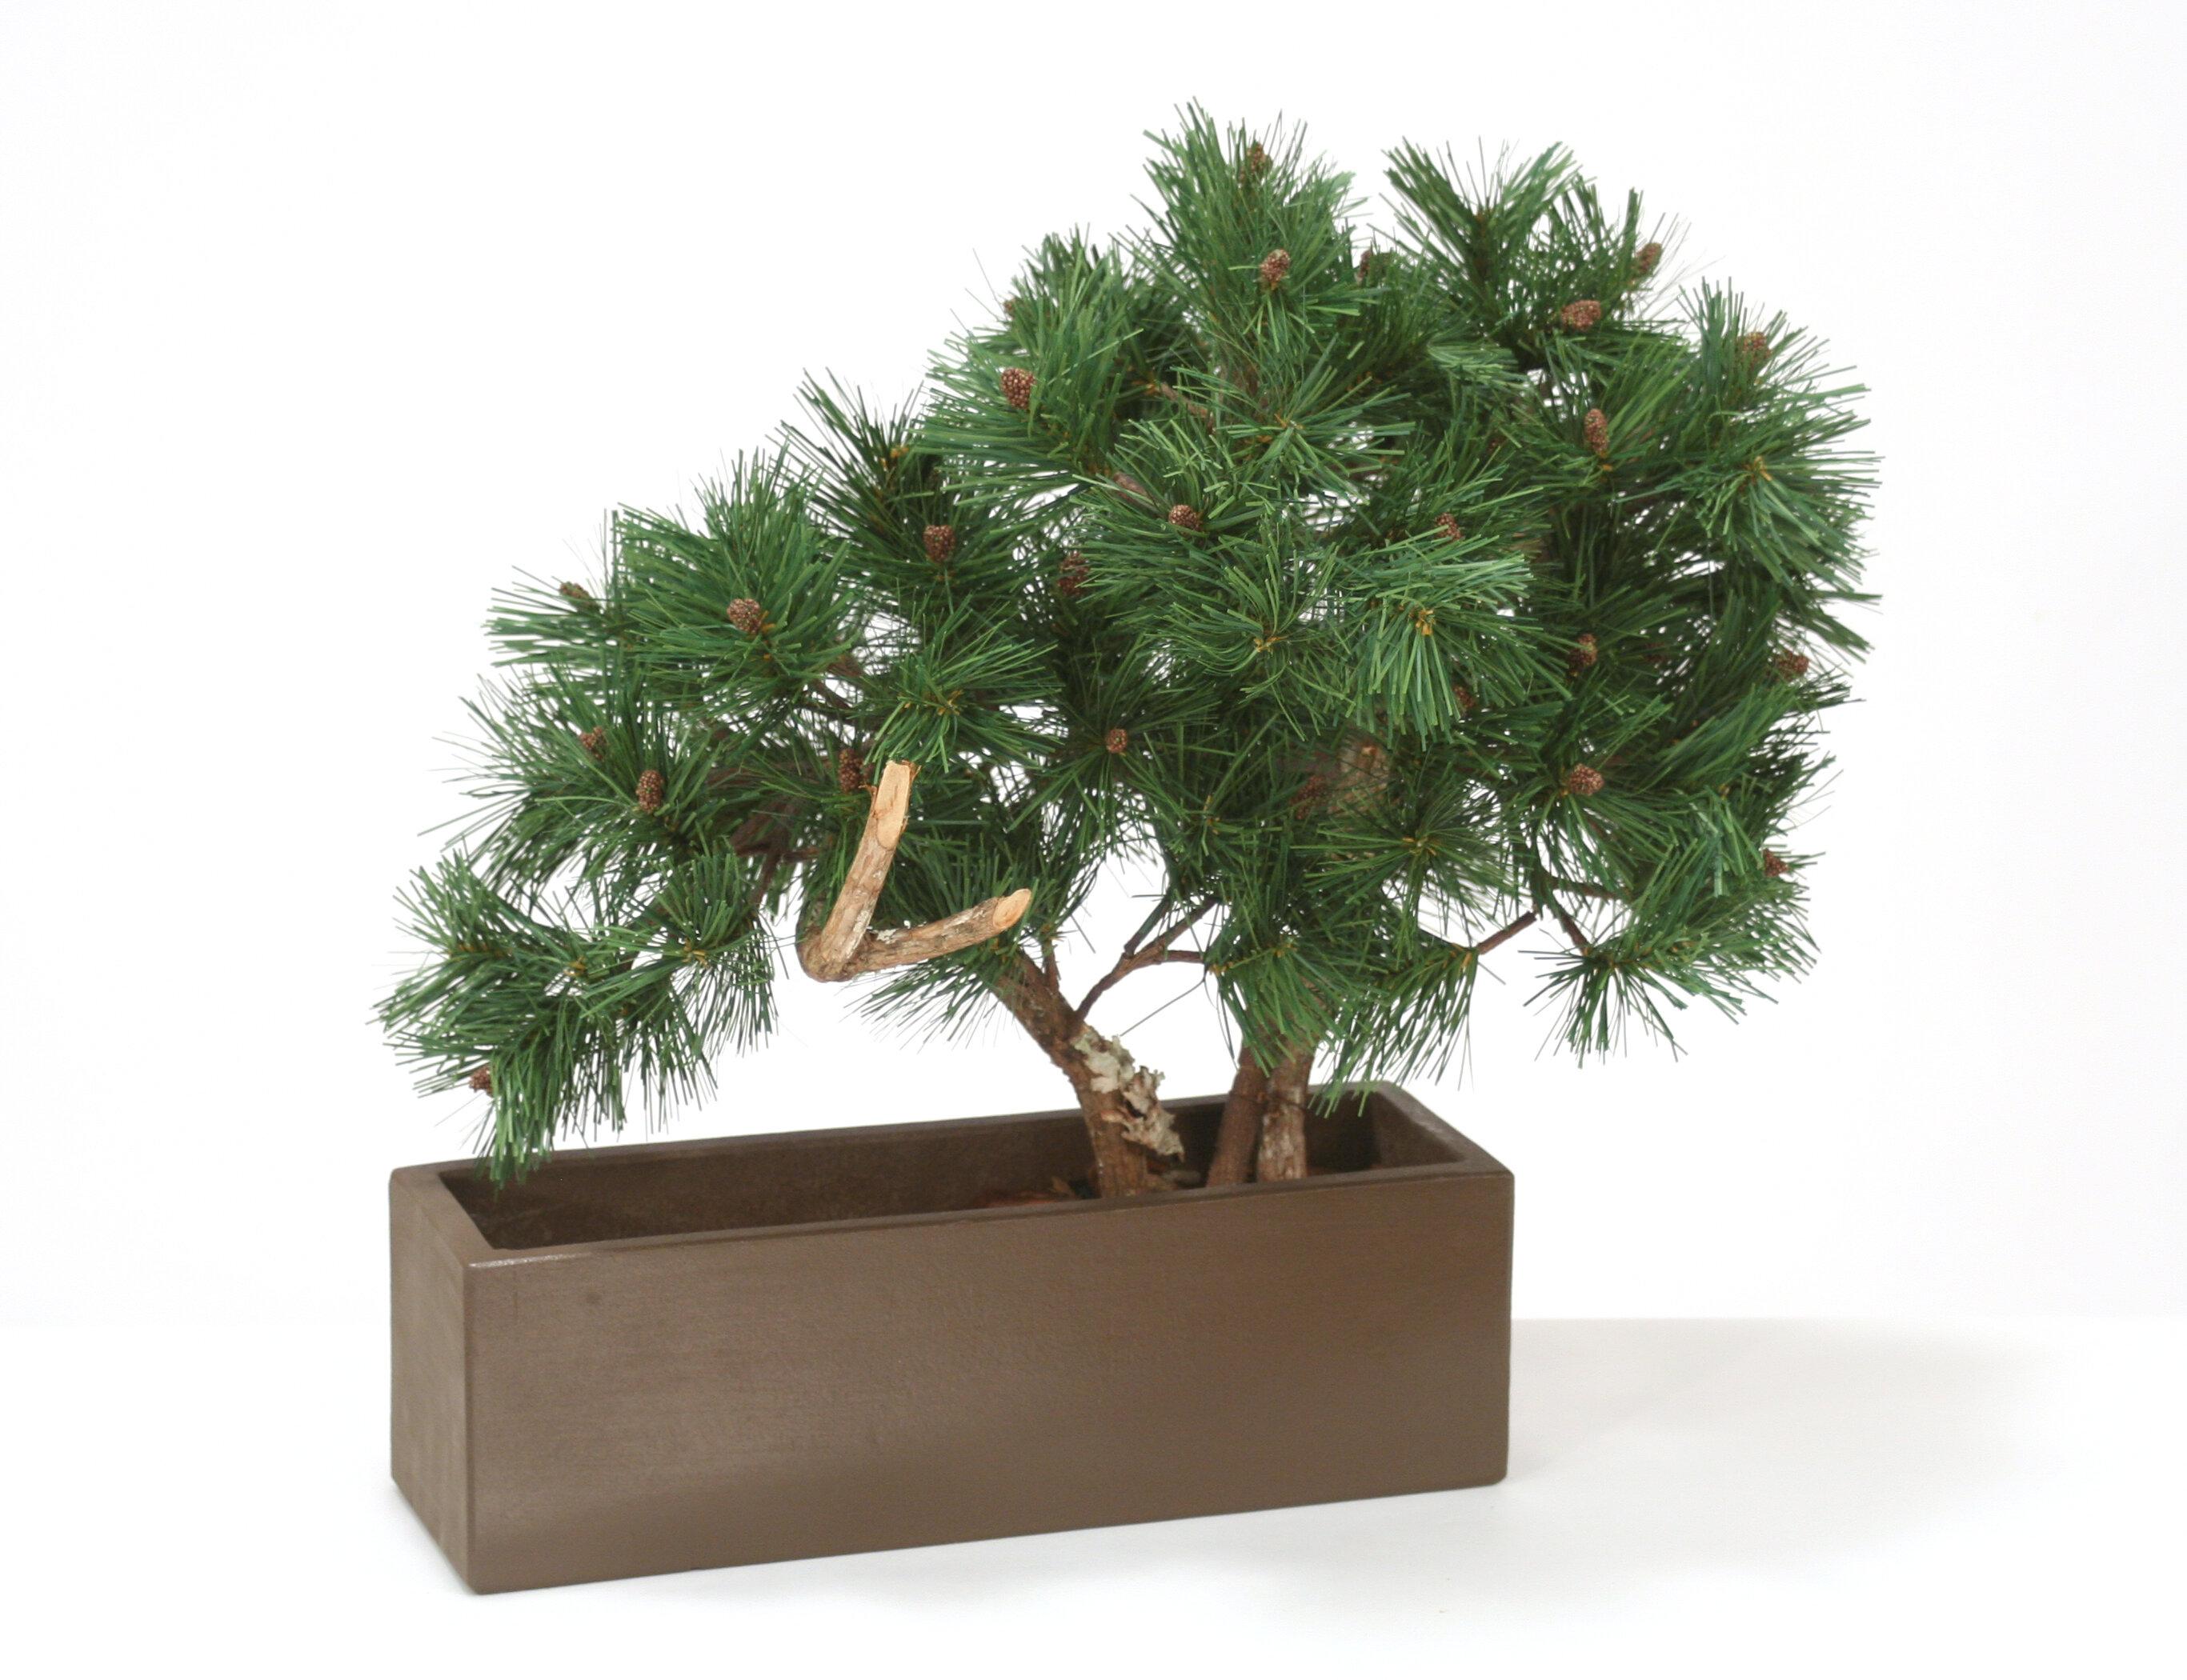 Distinctive Designs Pine Bonsai Tree In Pot Wayfair